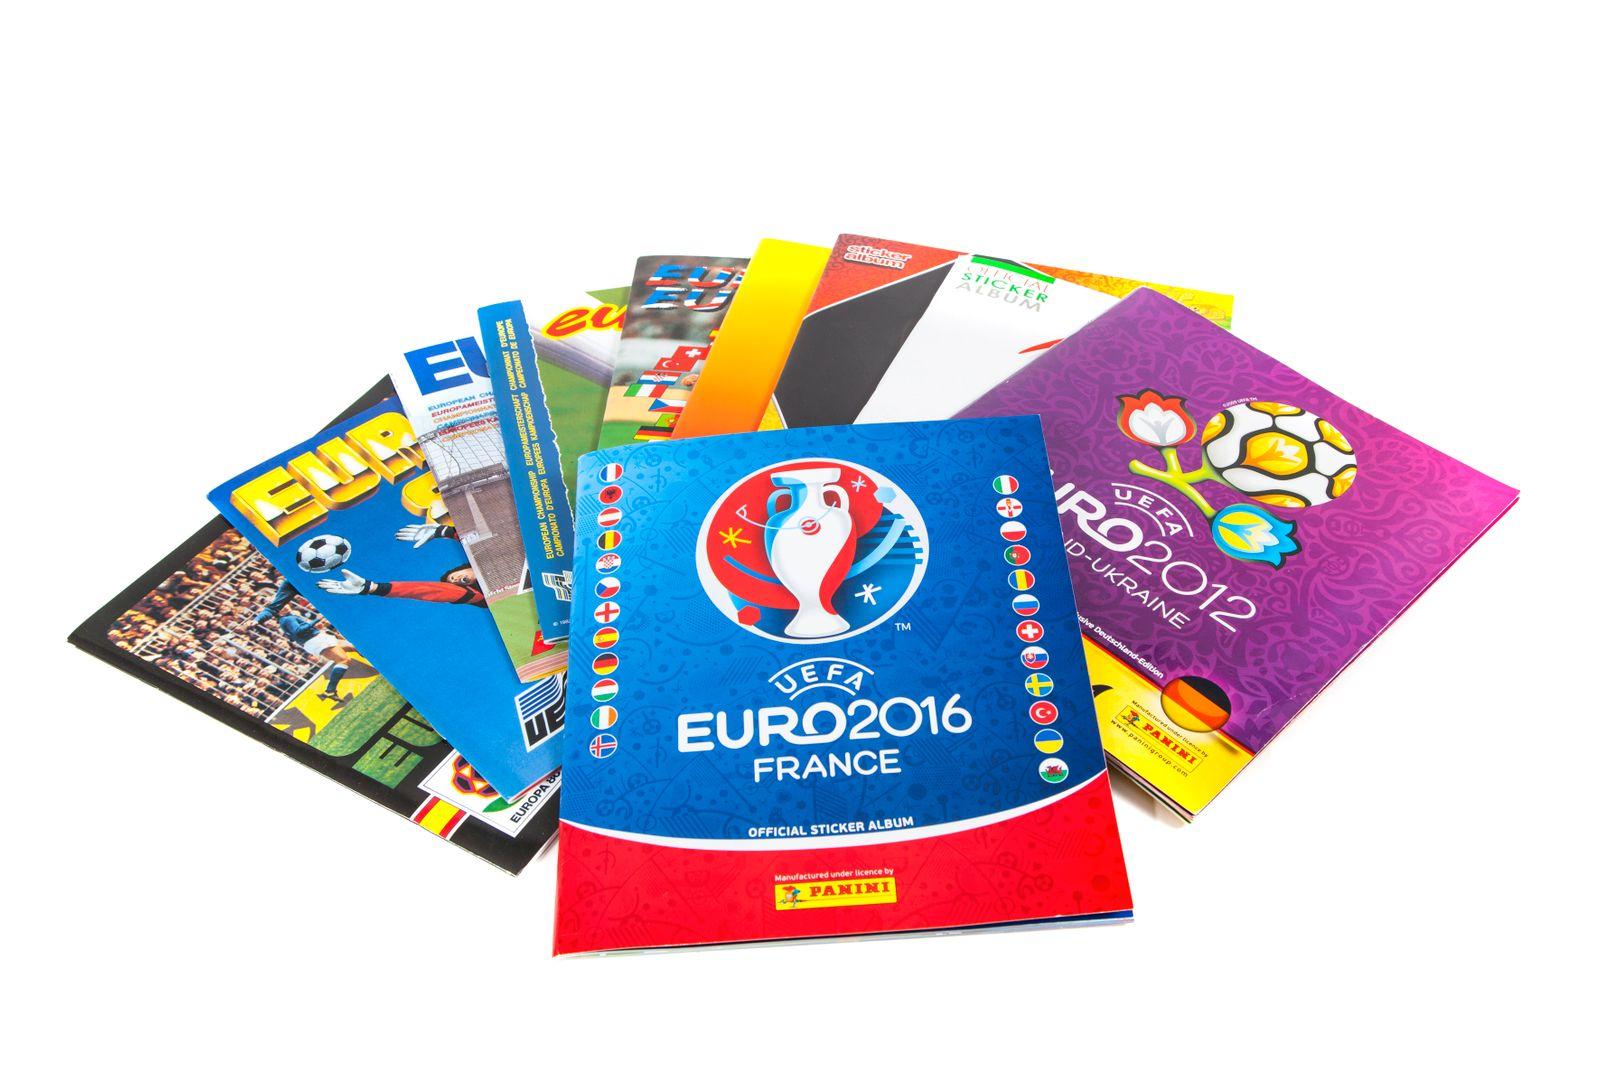 Paninin / EURO 2016